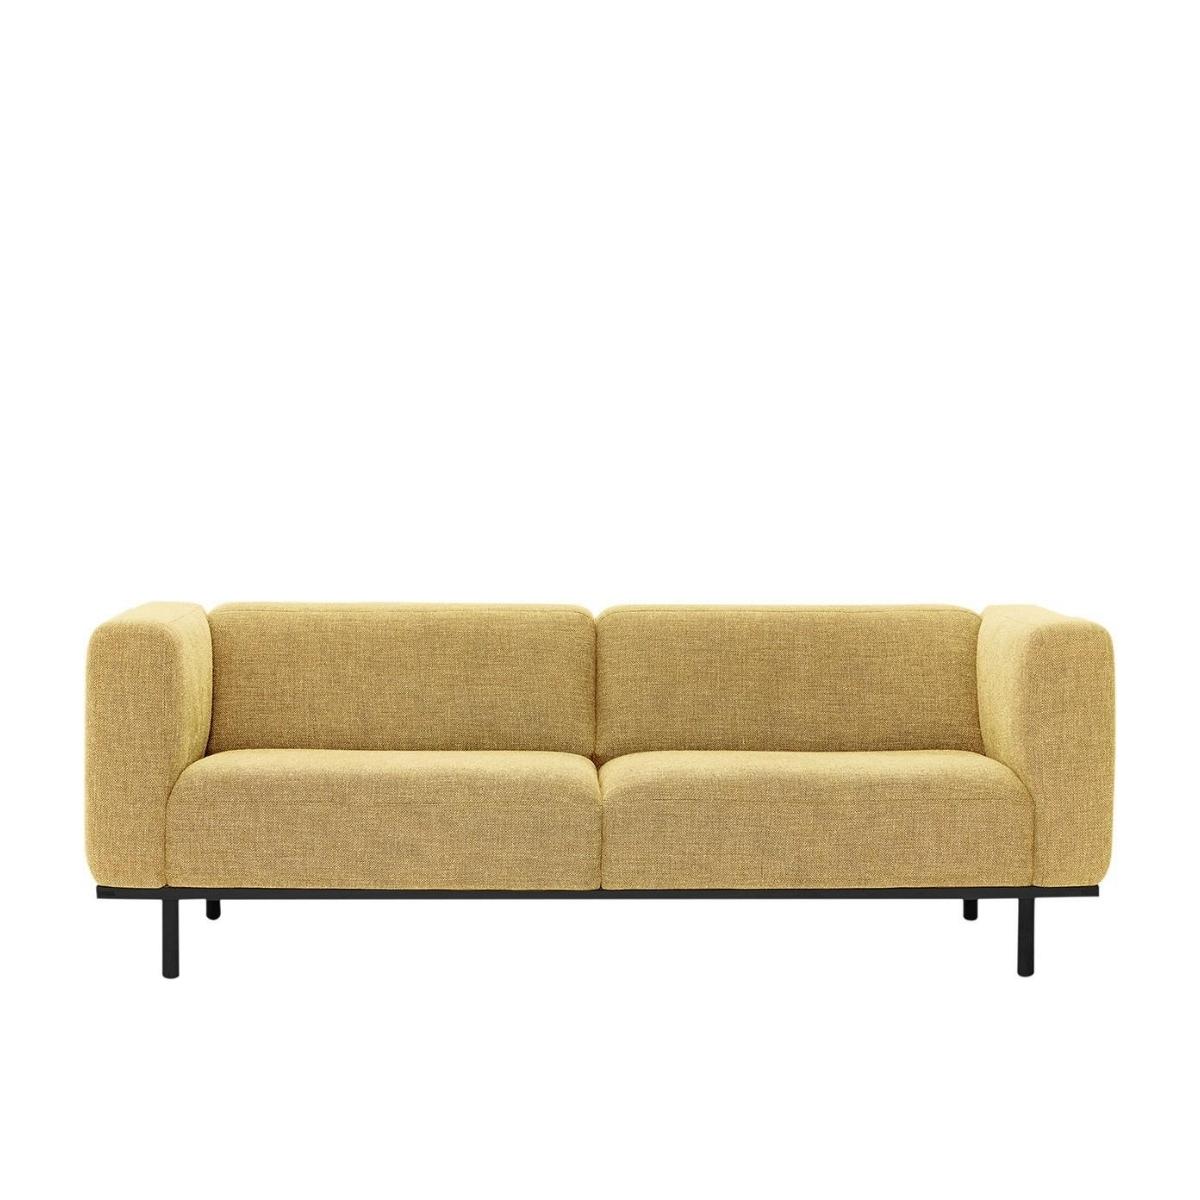 Andersen | A1 sofa - Bolighuset Werenberg